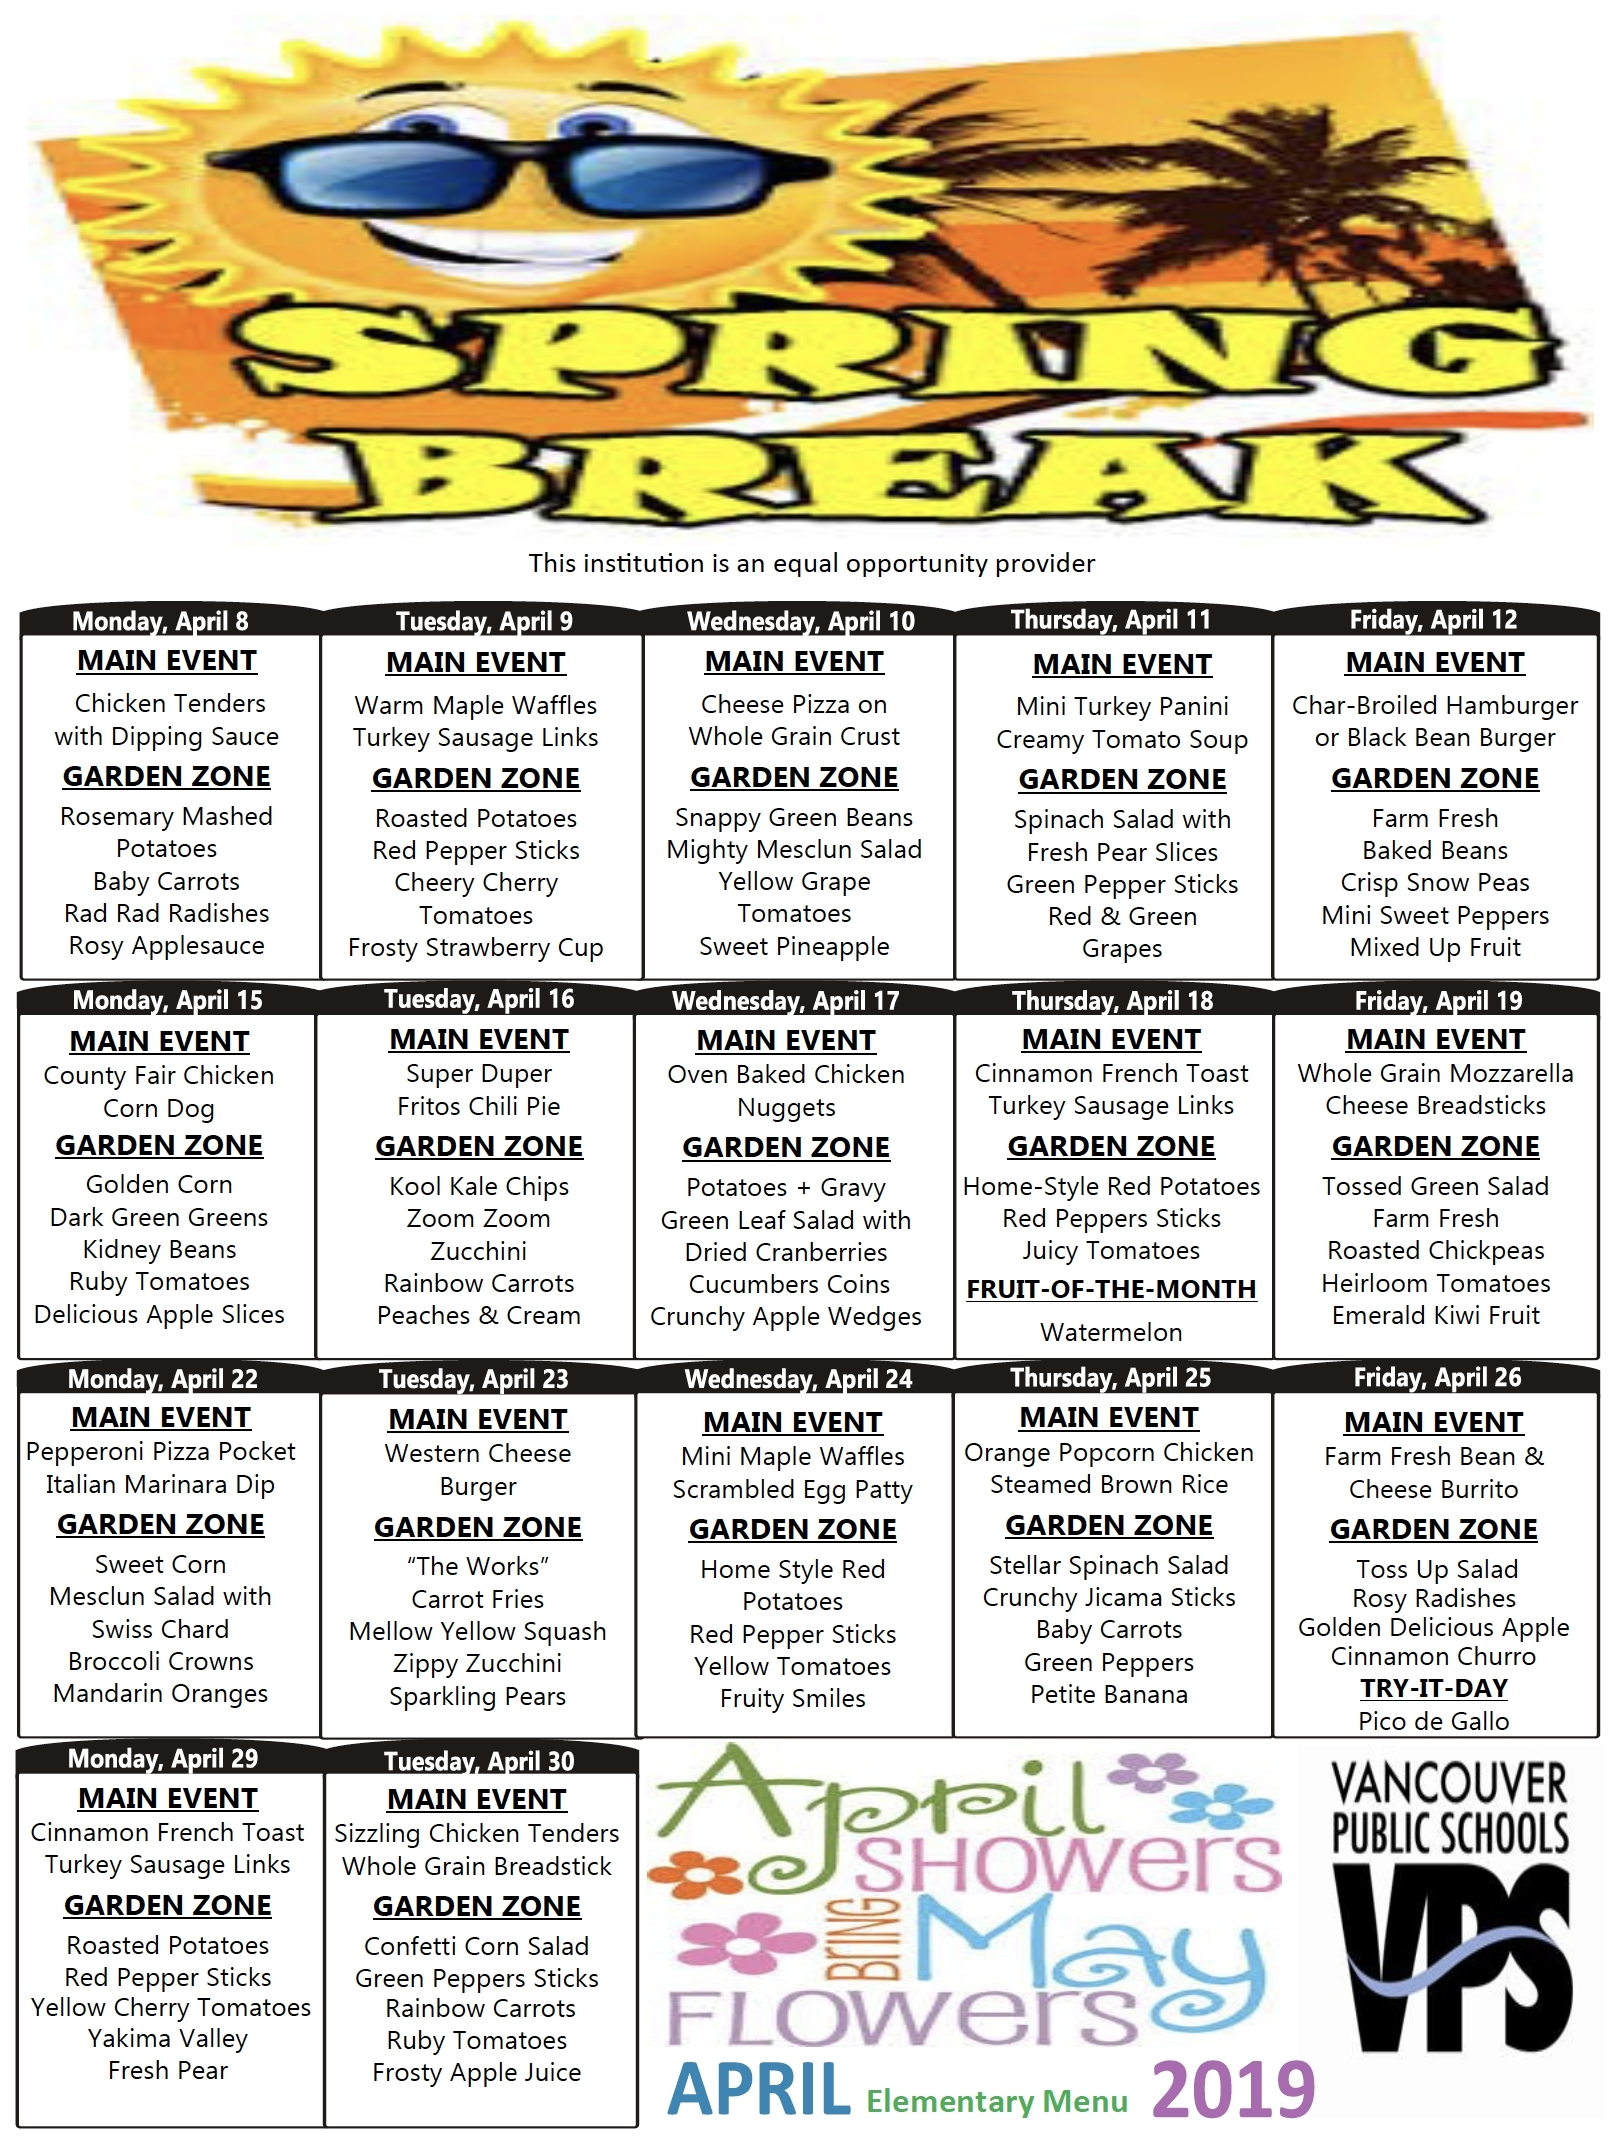 Impressive School Calendar Vancouver Wa • Printable Blank Calendar_School Calendar Vancouver Wa